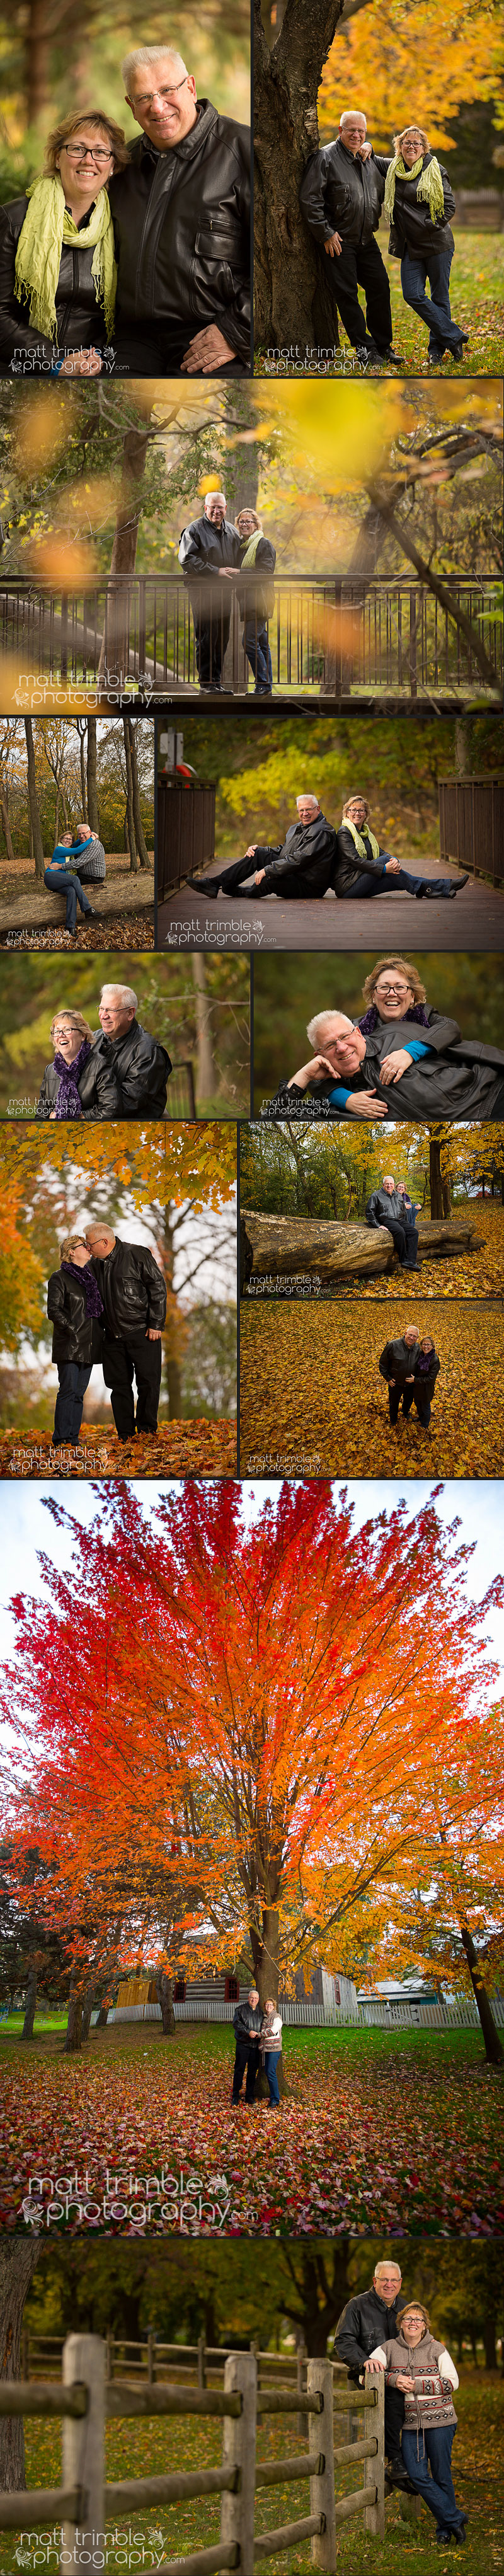 All Images Copyright Matt Trimble Photography